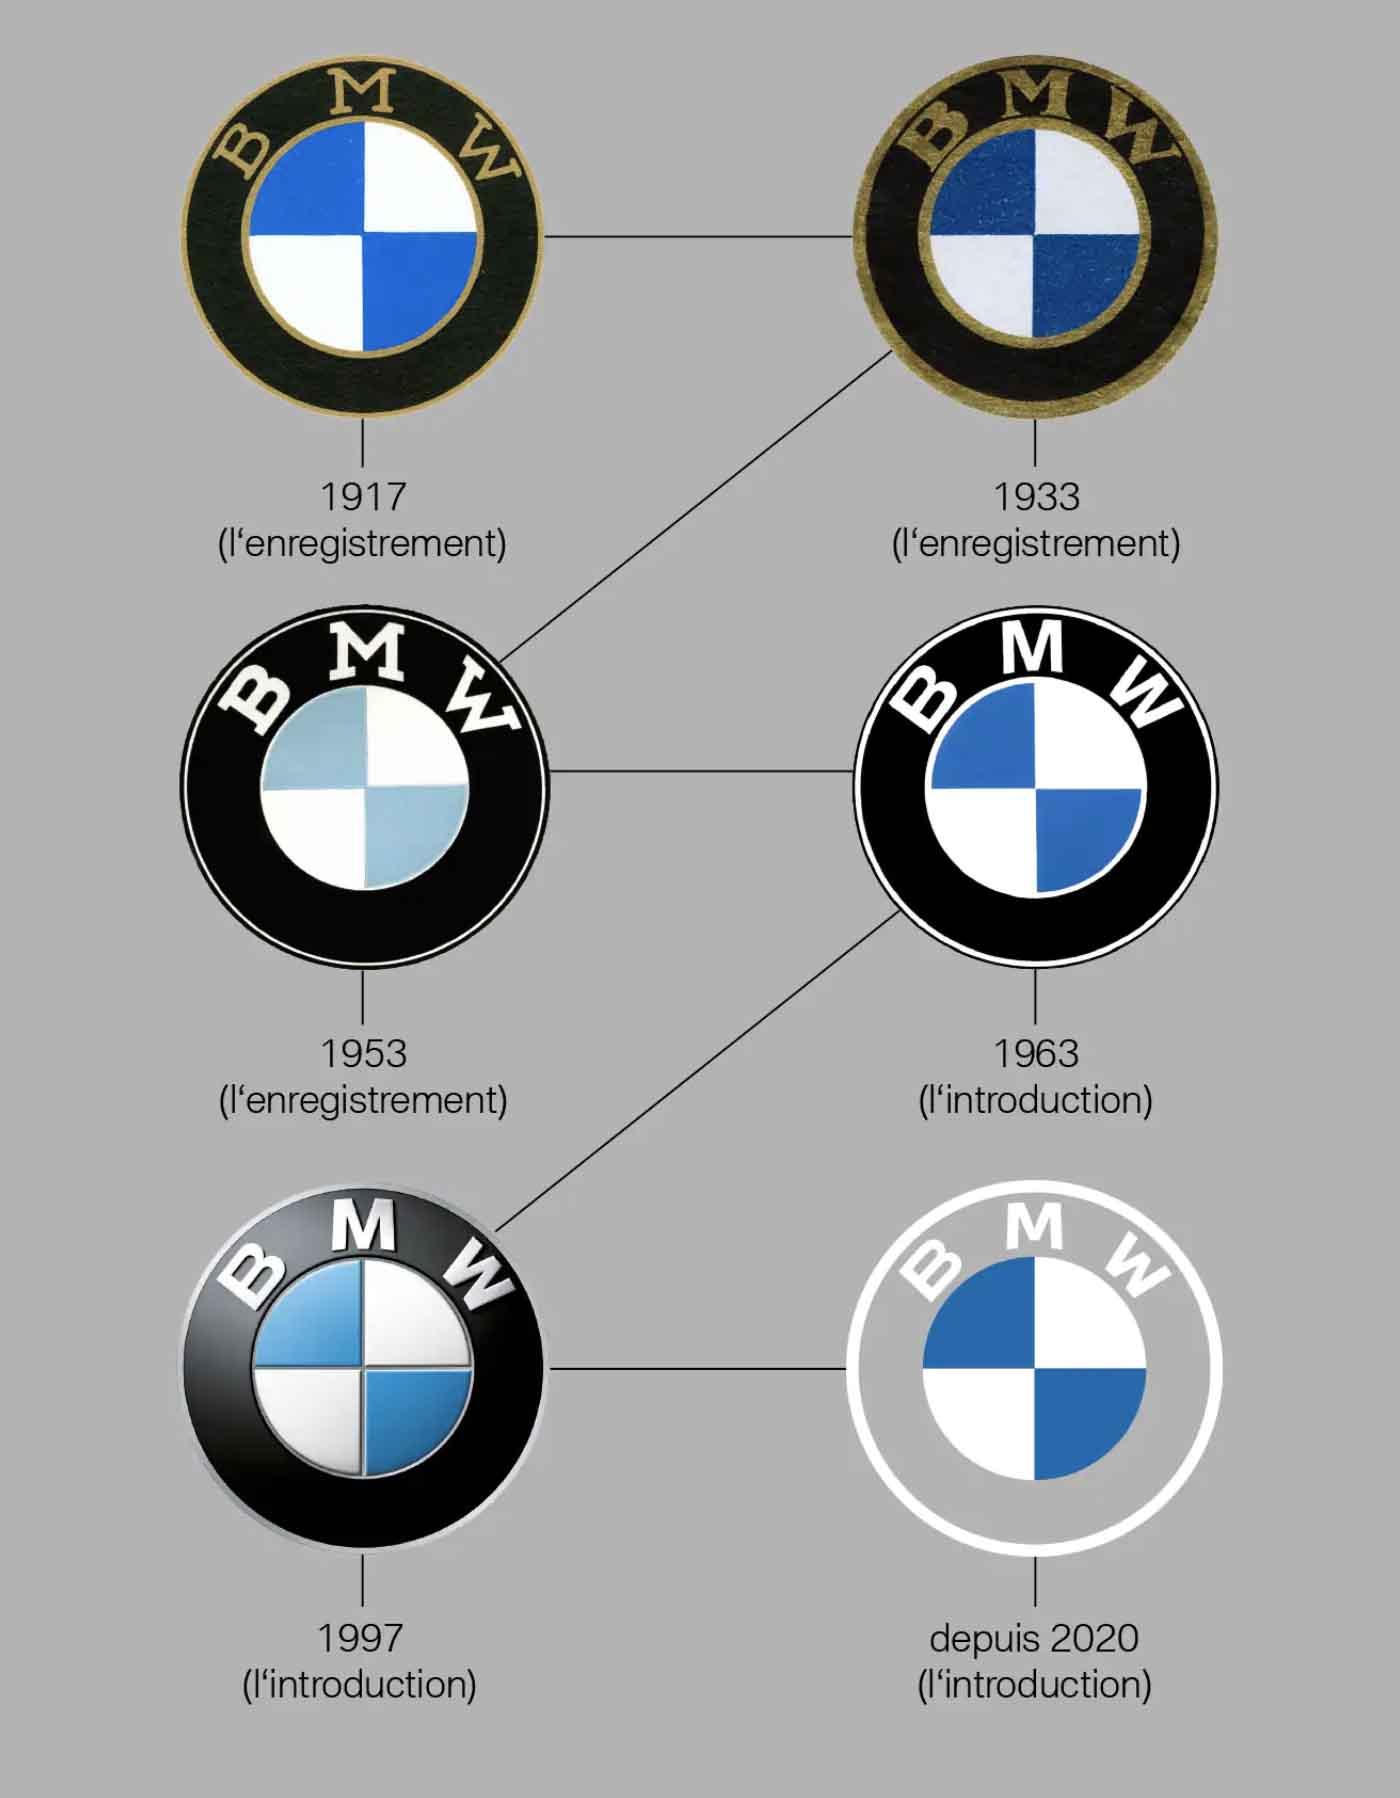 nouveau logo BMW 2020 flat design